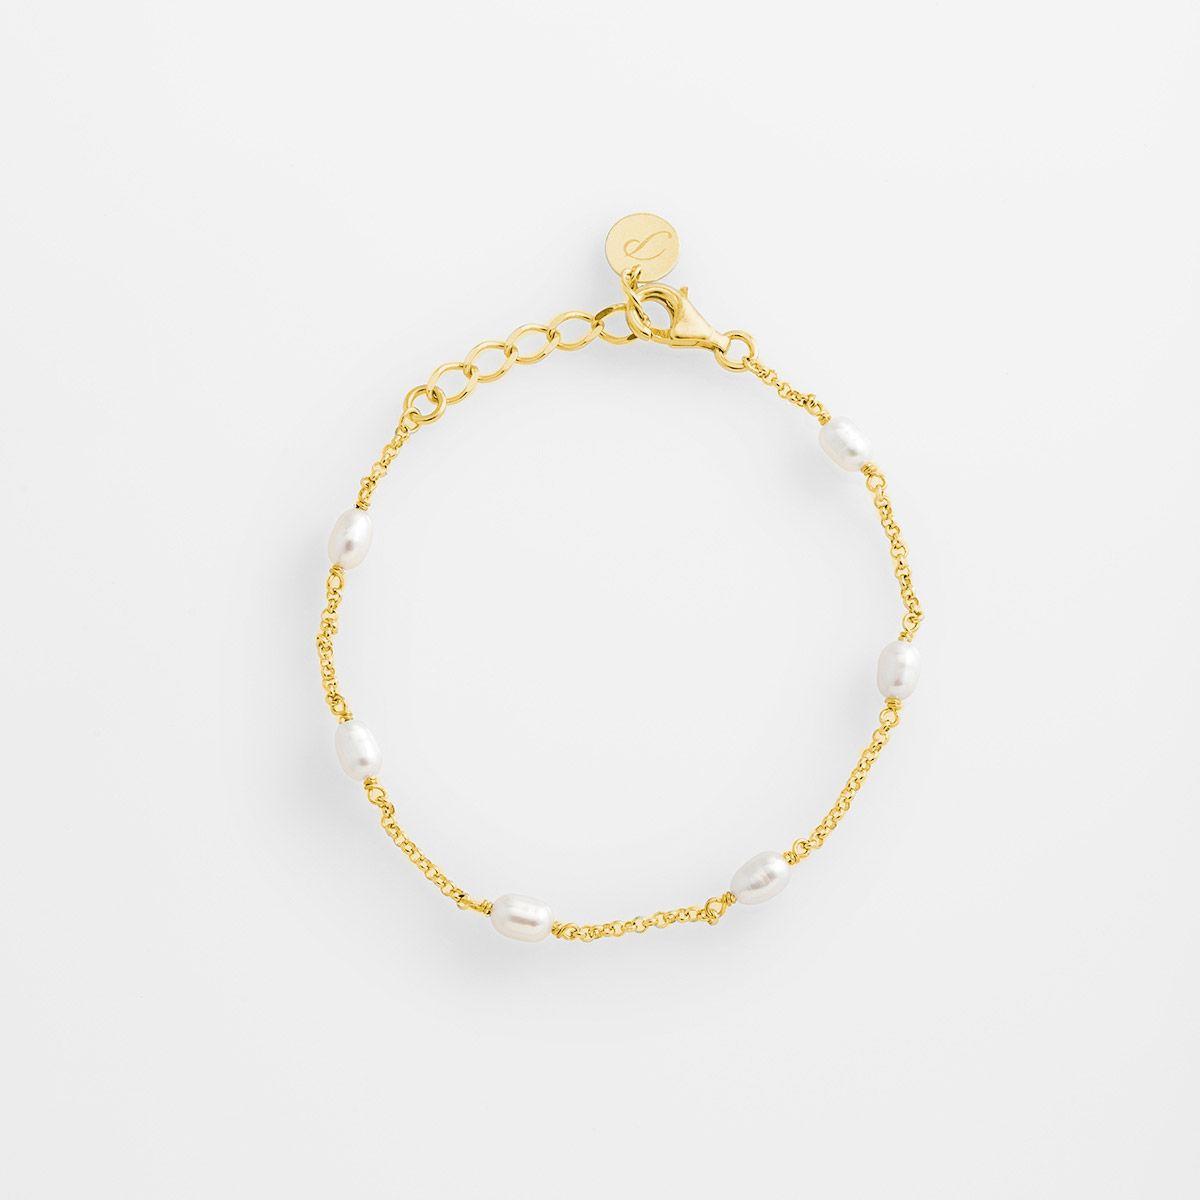 Coco - Perlenarmband - Gold